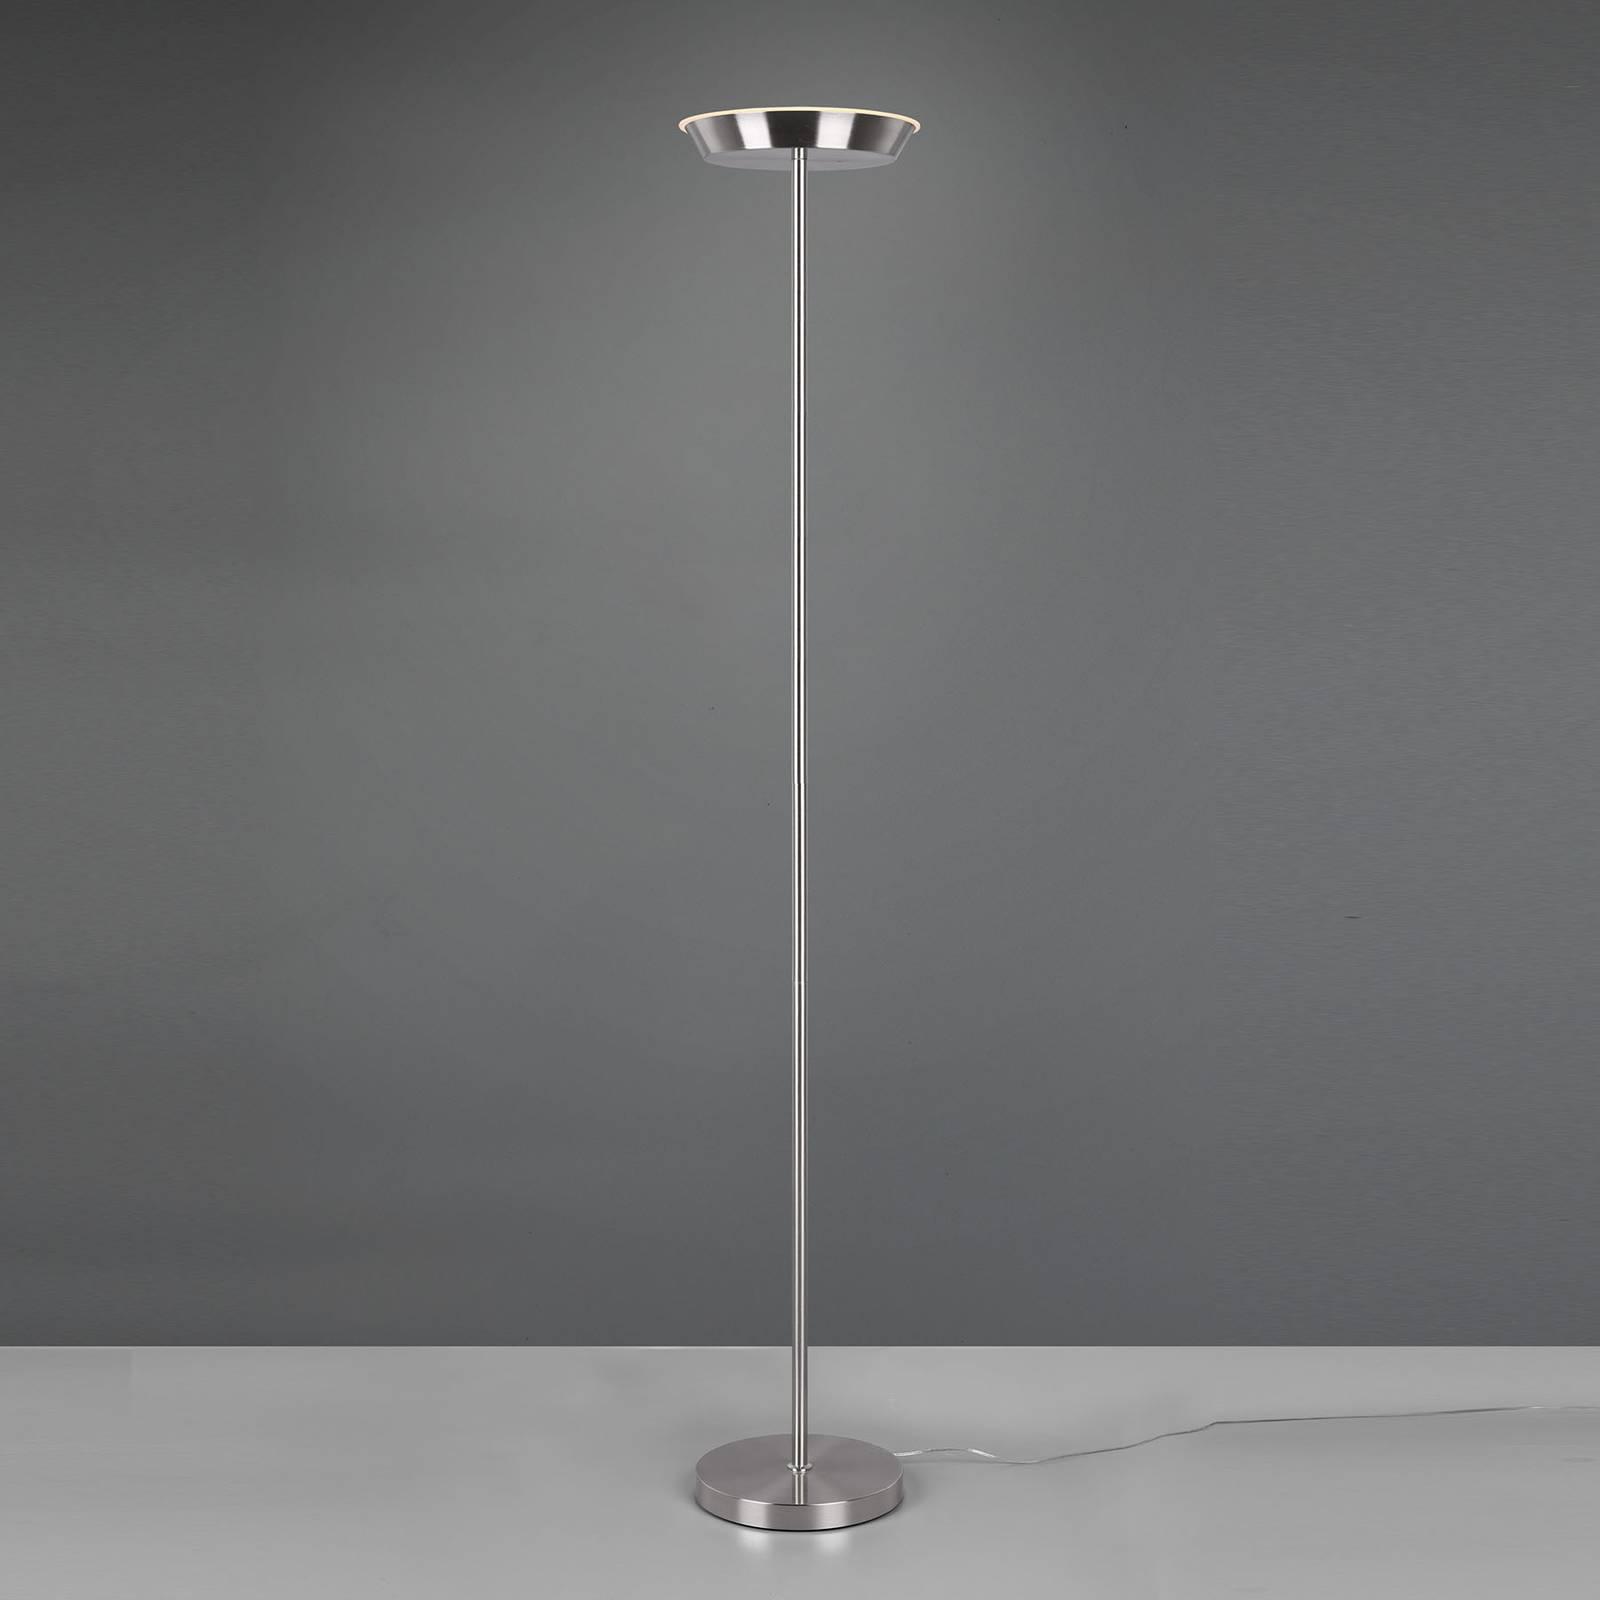 Ylössuunnattu LED-valaisin Swona WiZ matta nikkeli